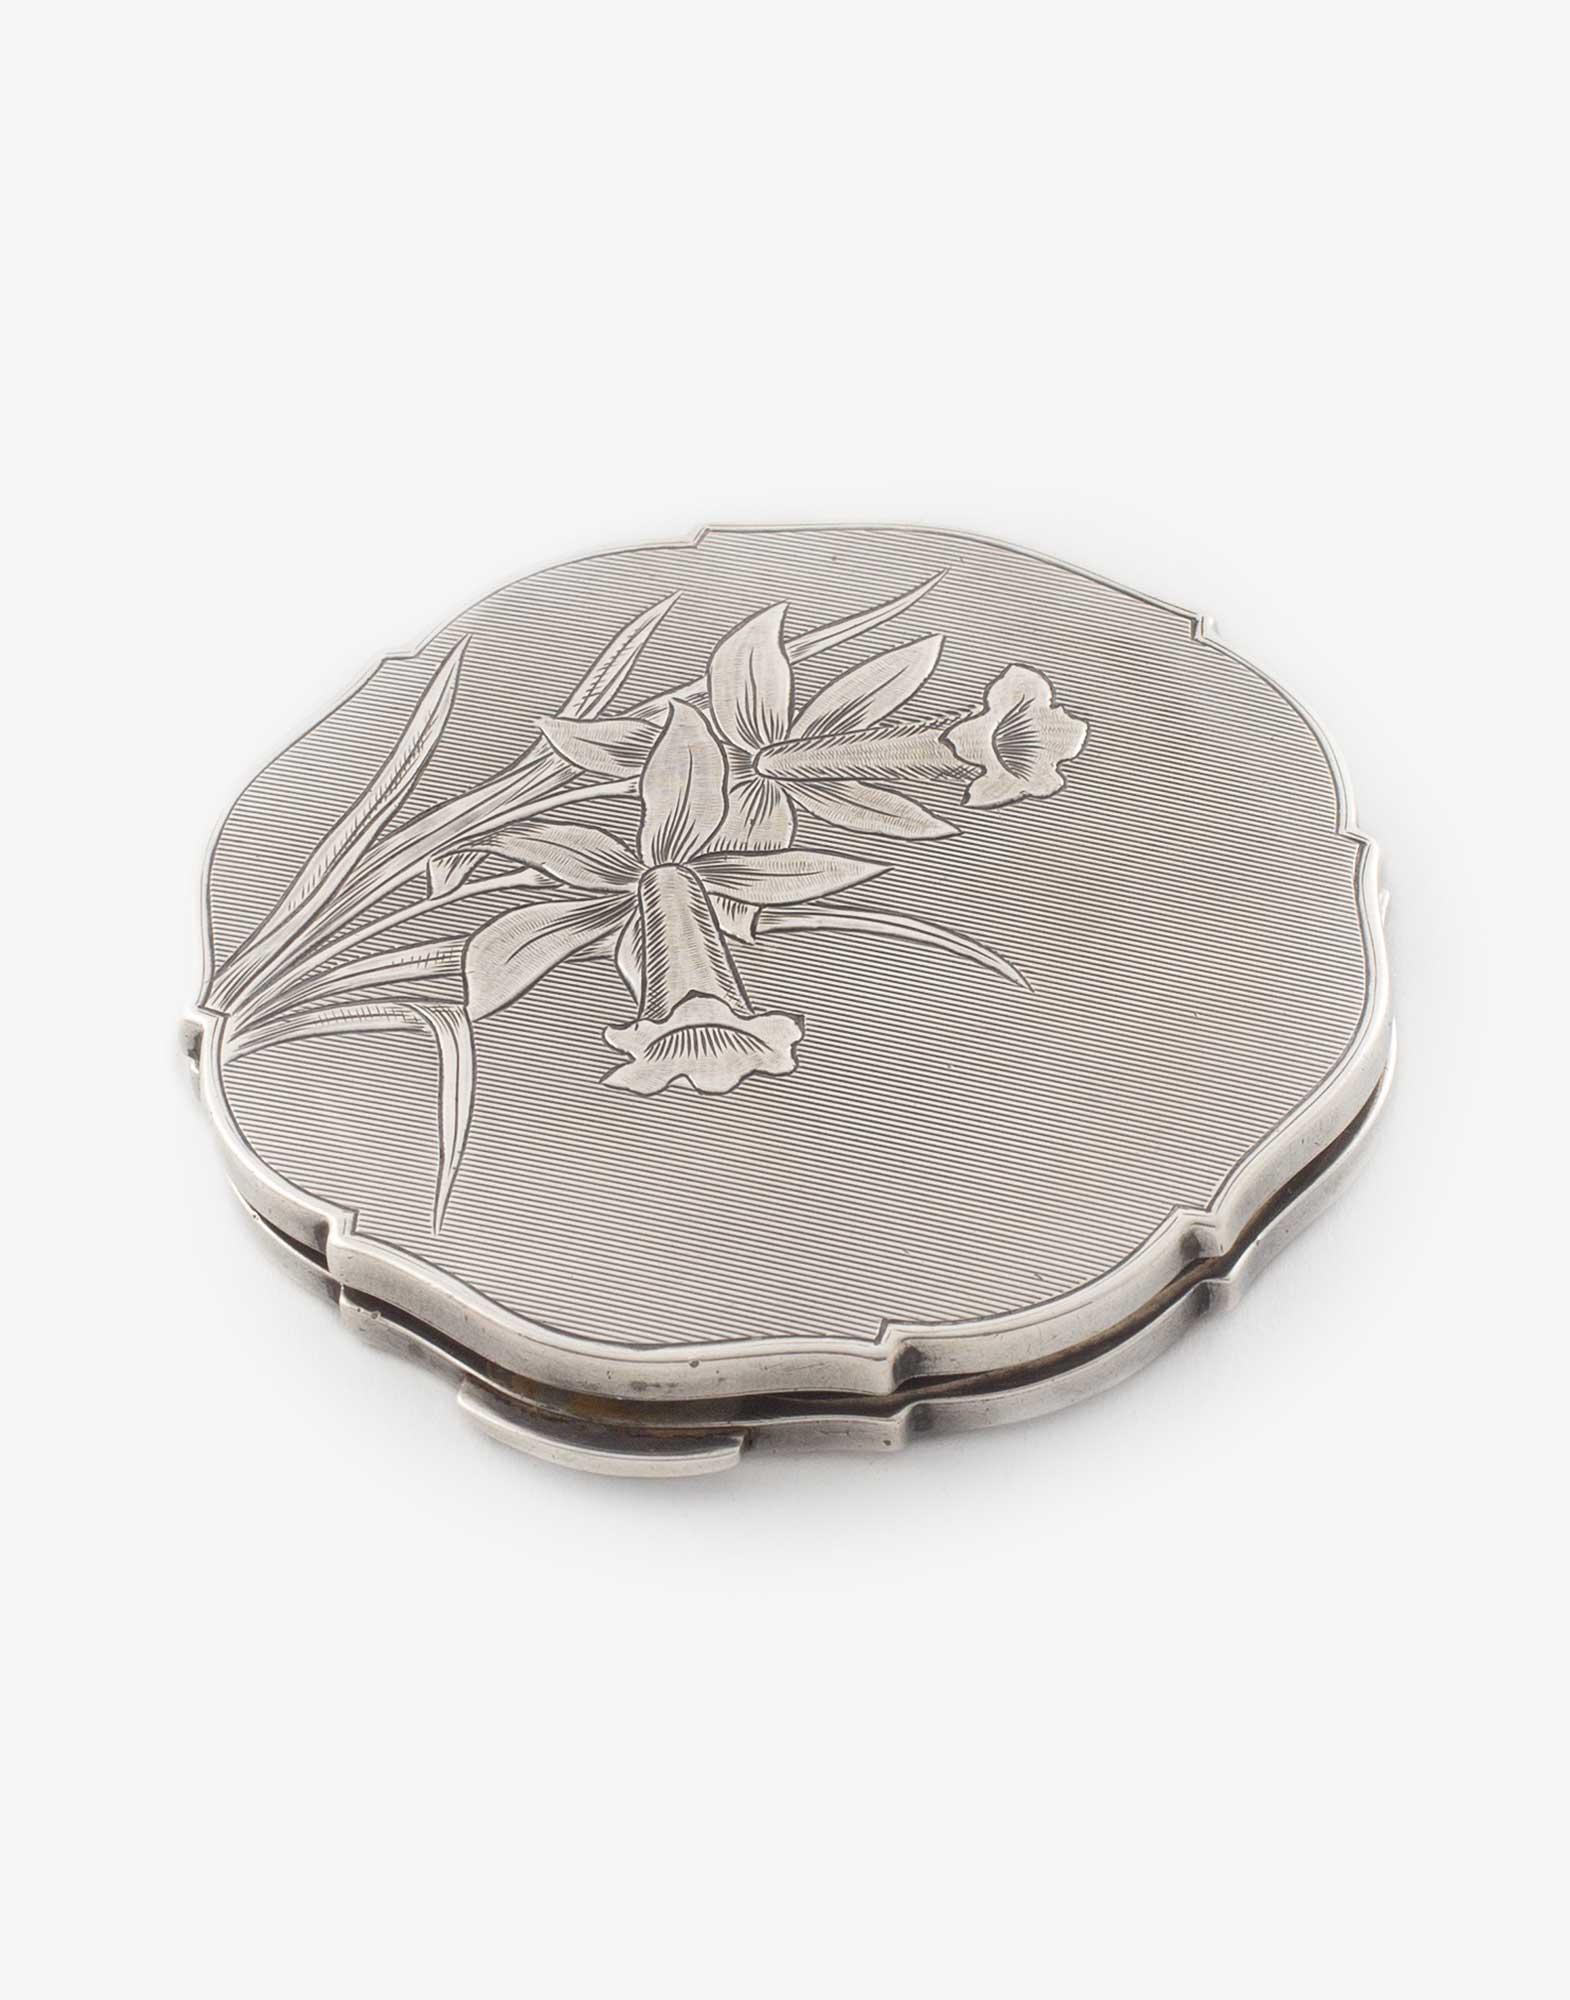 Antique Silver Poudrier Compact